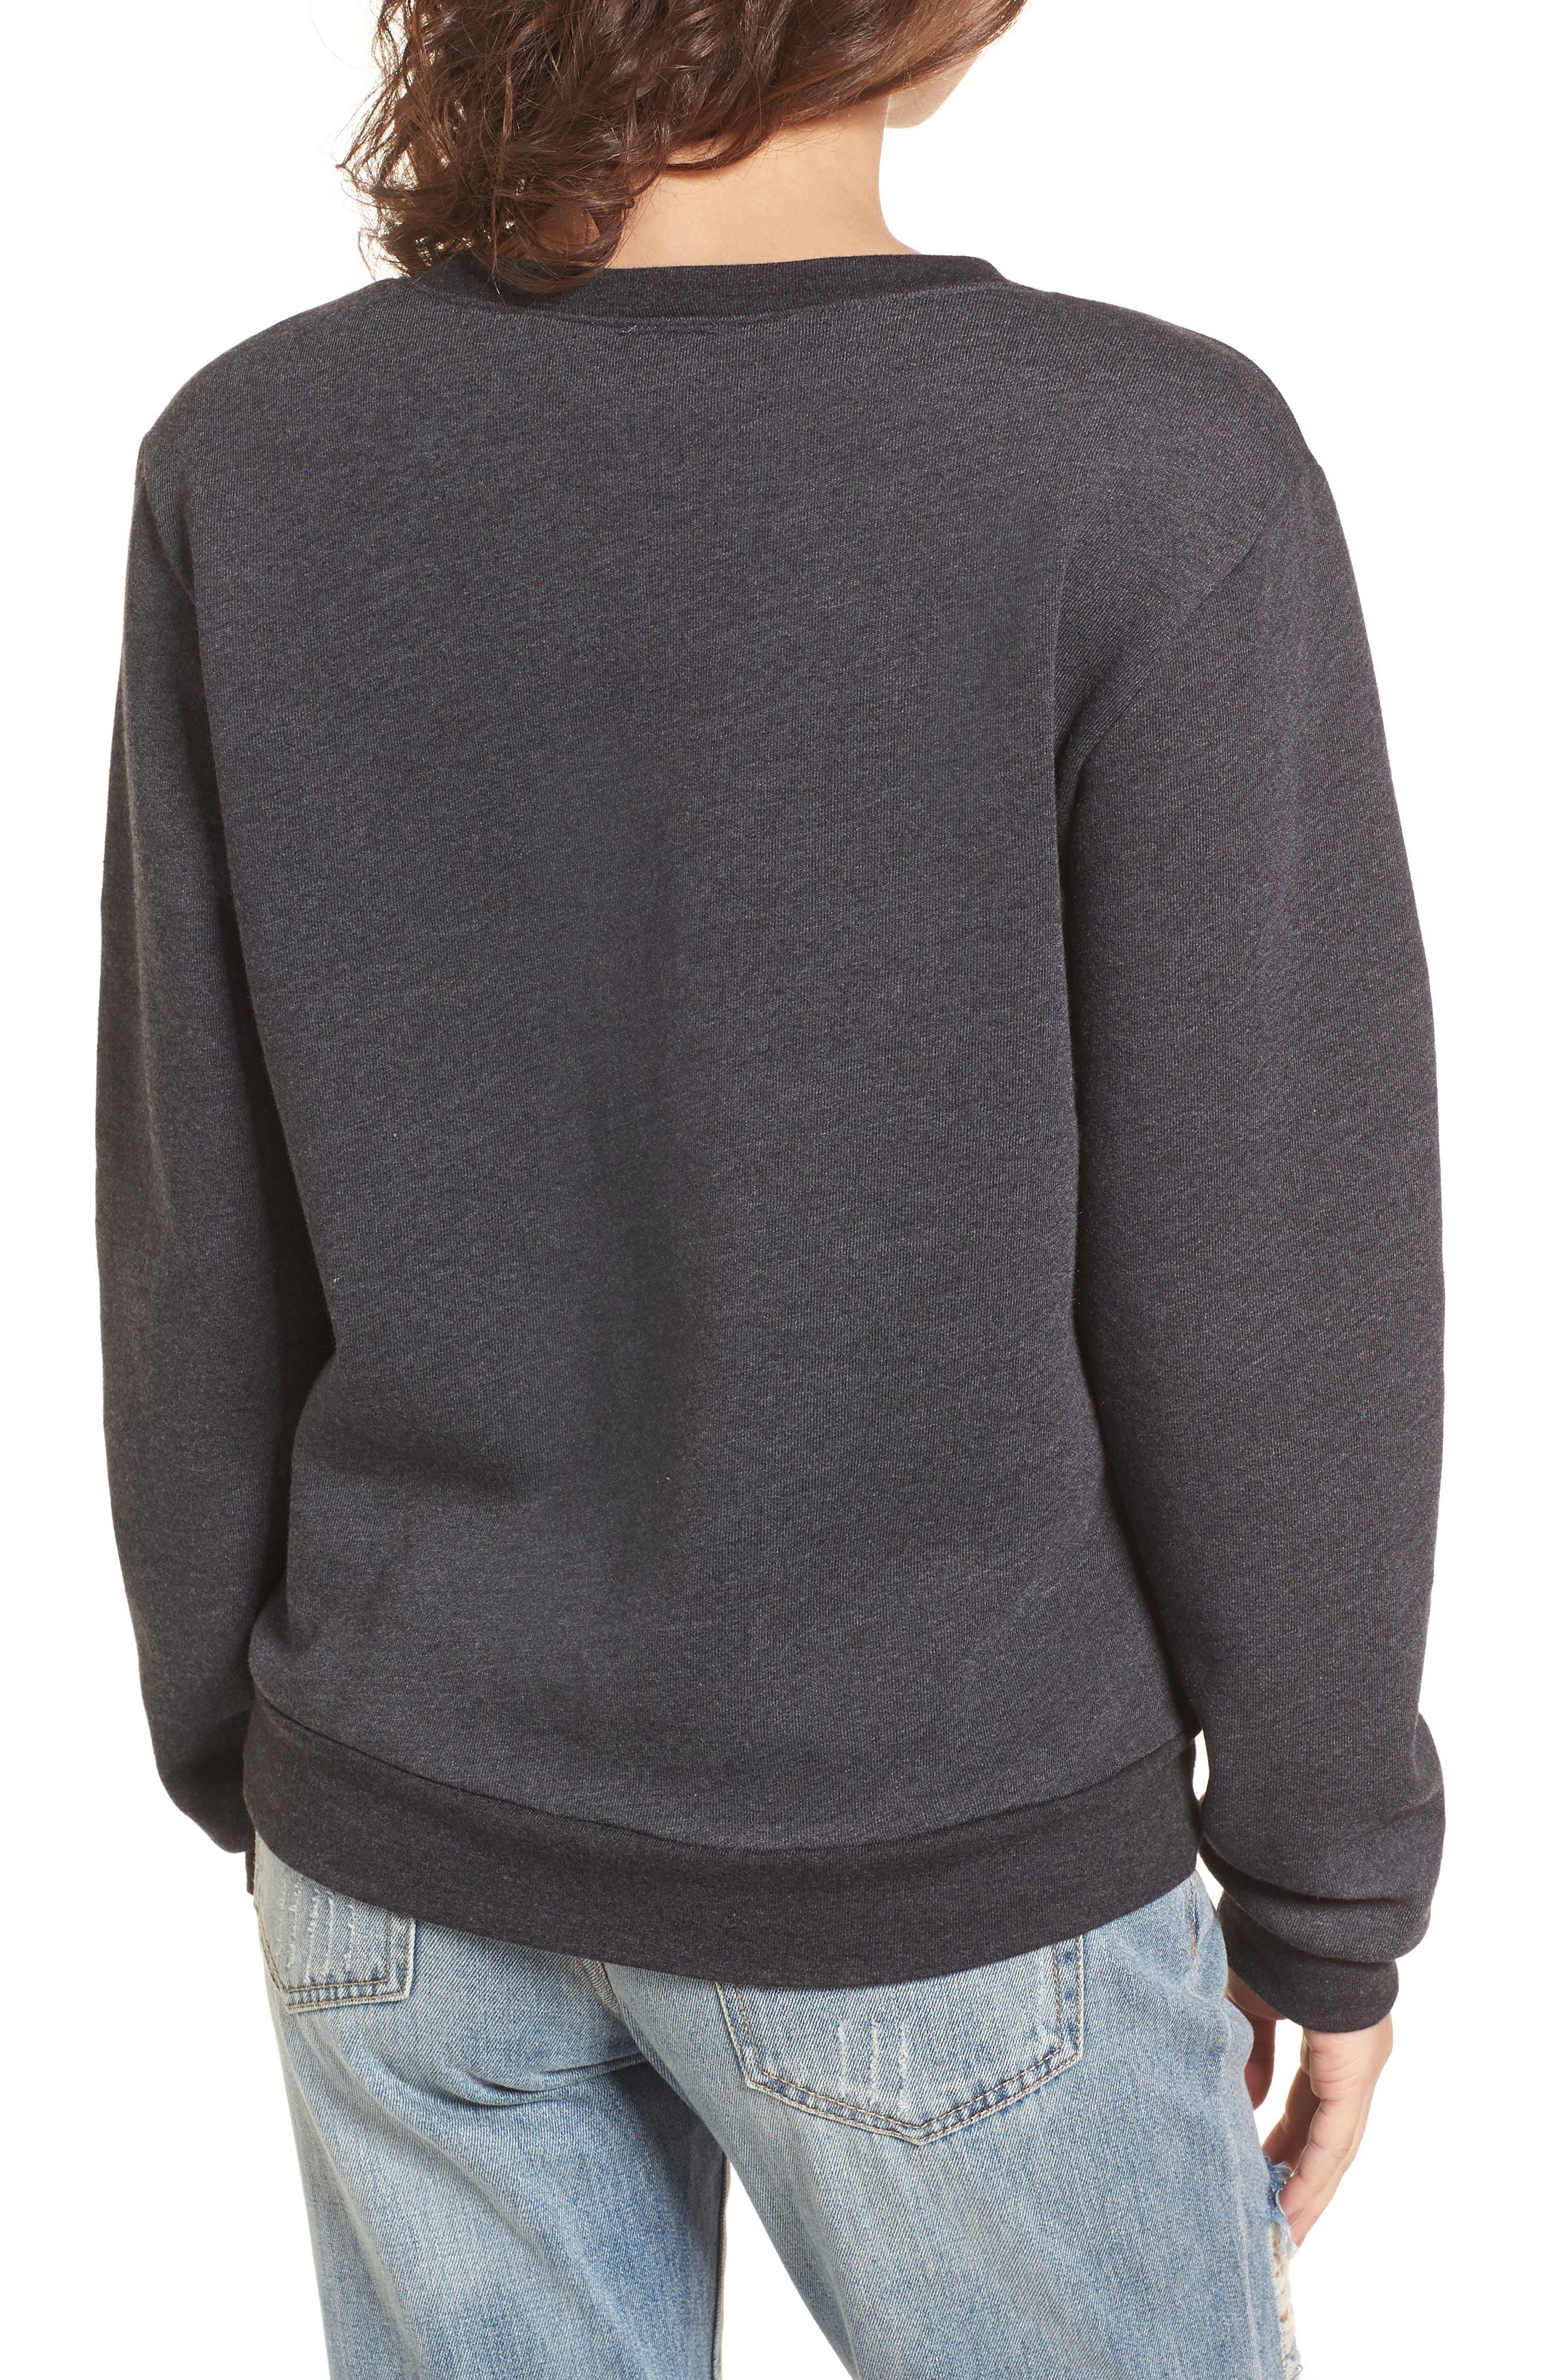 Bonjour Sweatshirt,                             Alternate thumbnail 2, color,                             Faded Black